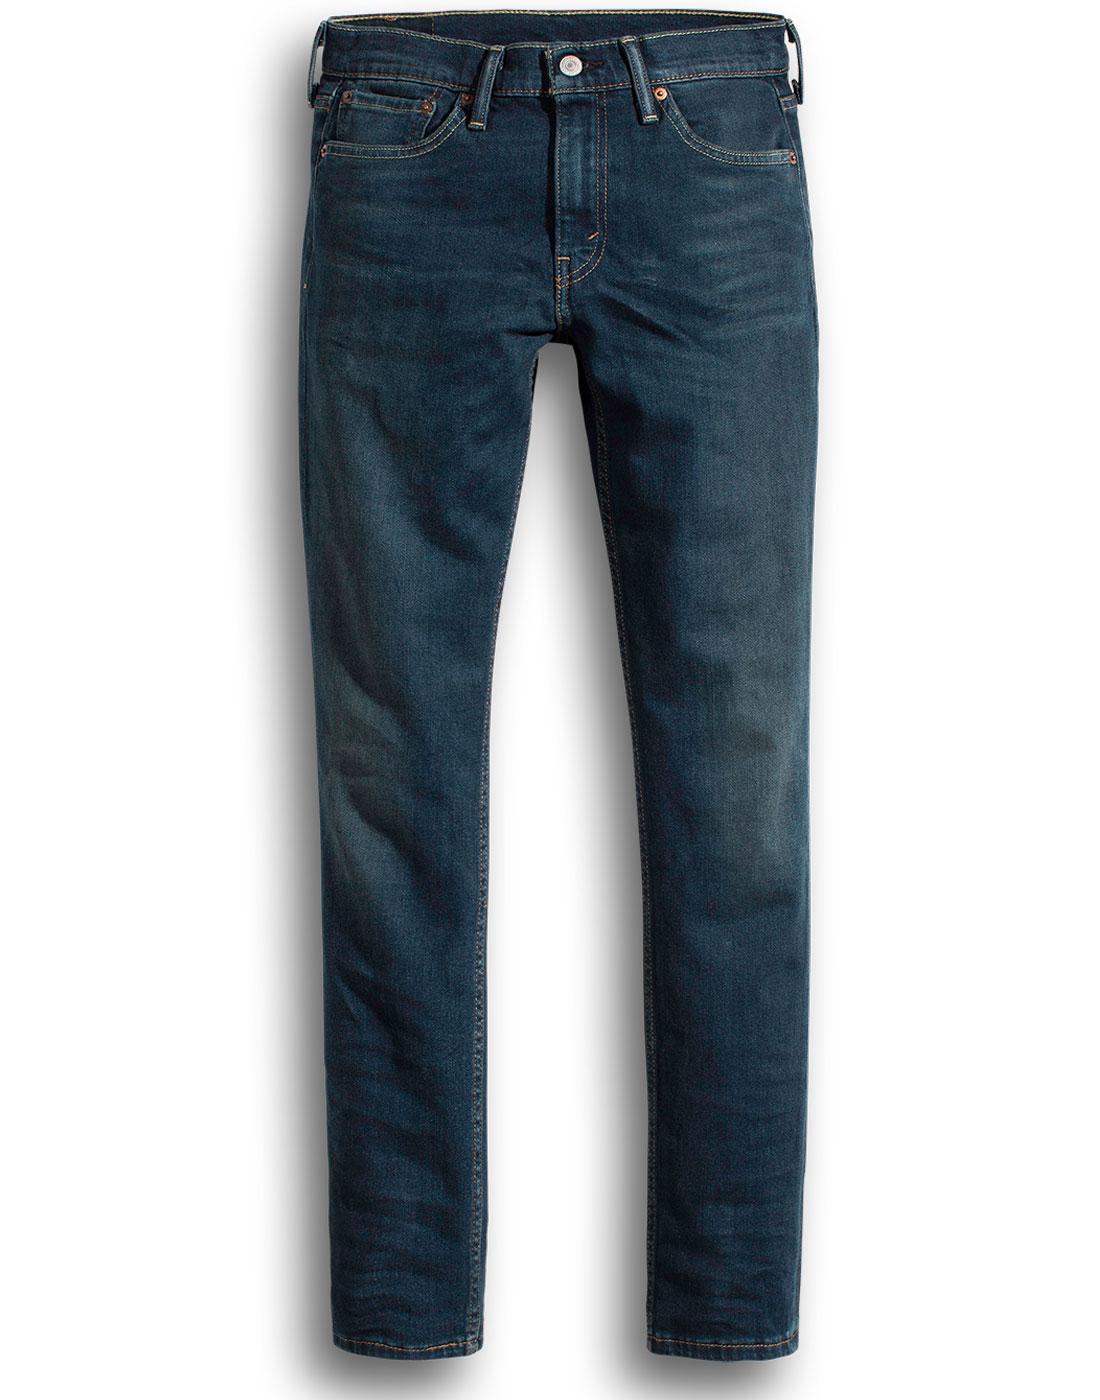 LEVI'S 512 Slim Taper Fit Retro Denim Jeans ROTH